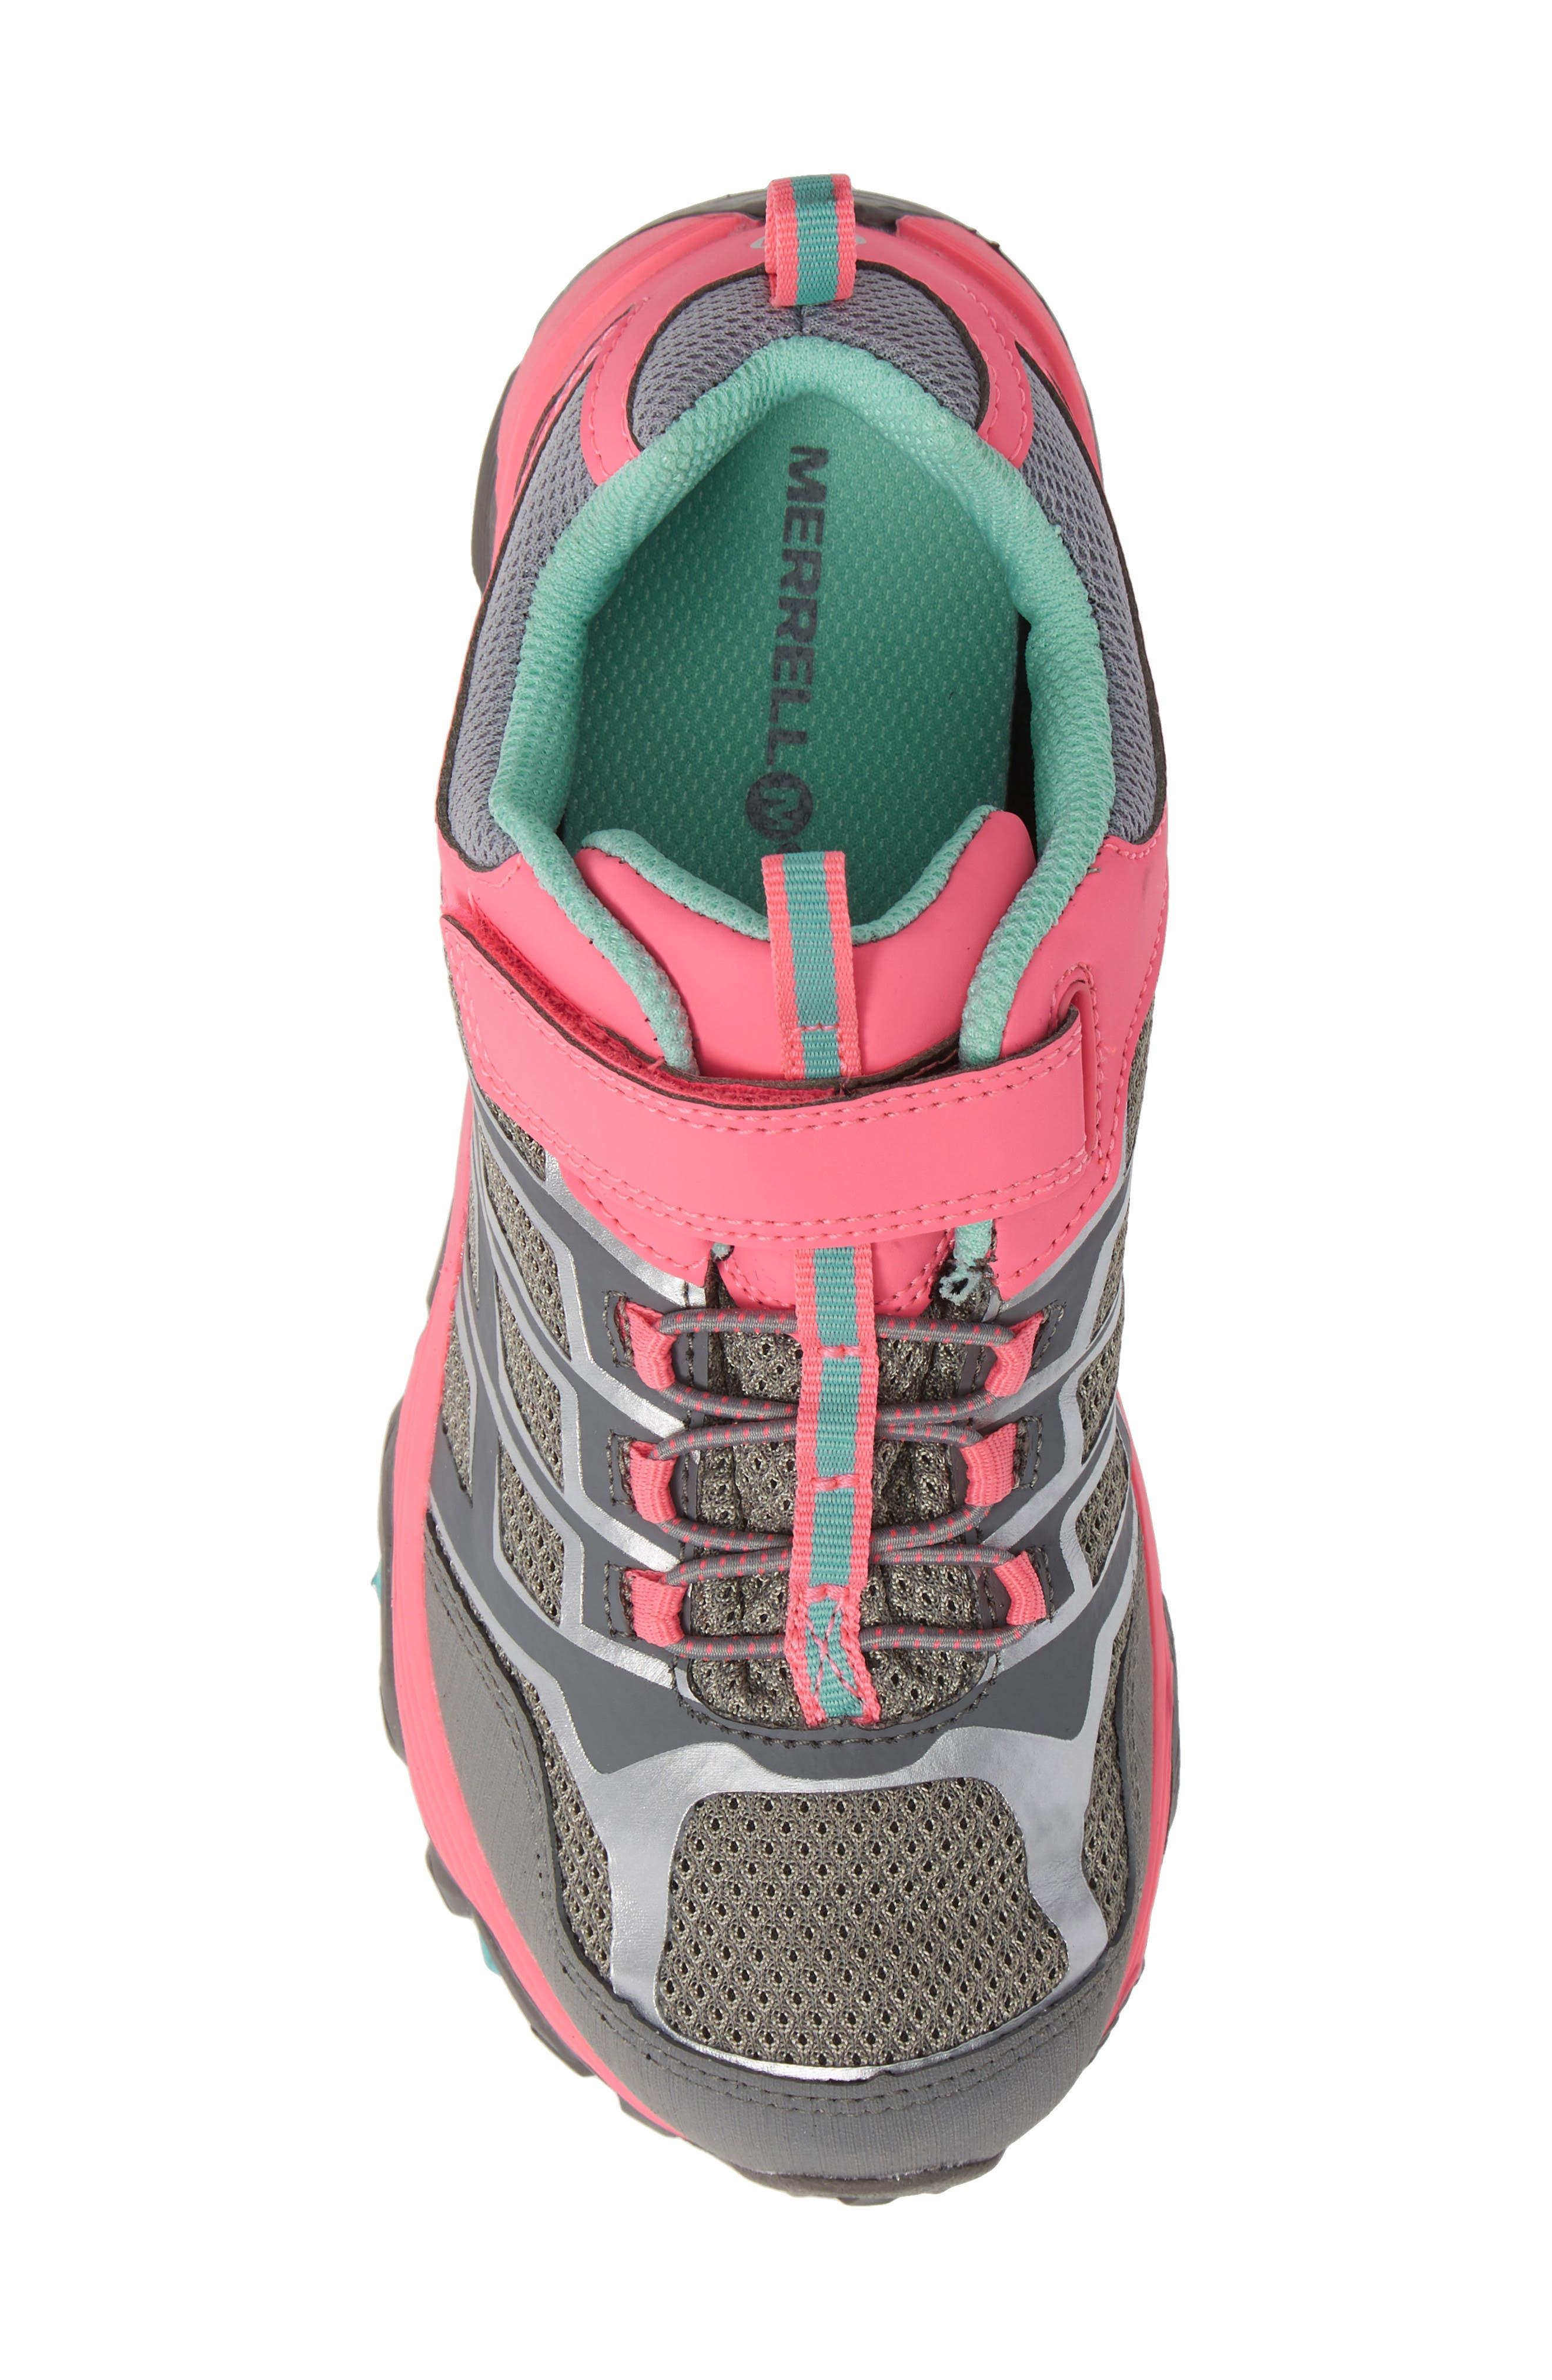 MERRELL, Moab FST Polar Low Waterproof Sneaker, Alternate thumbnail 5, color, GREY/ CORAL